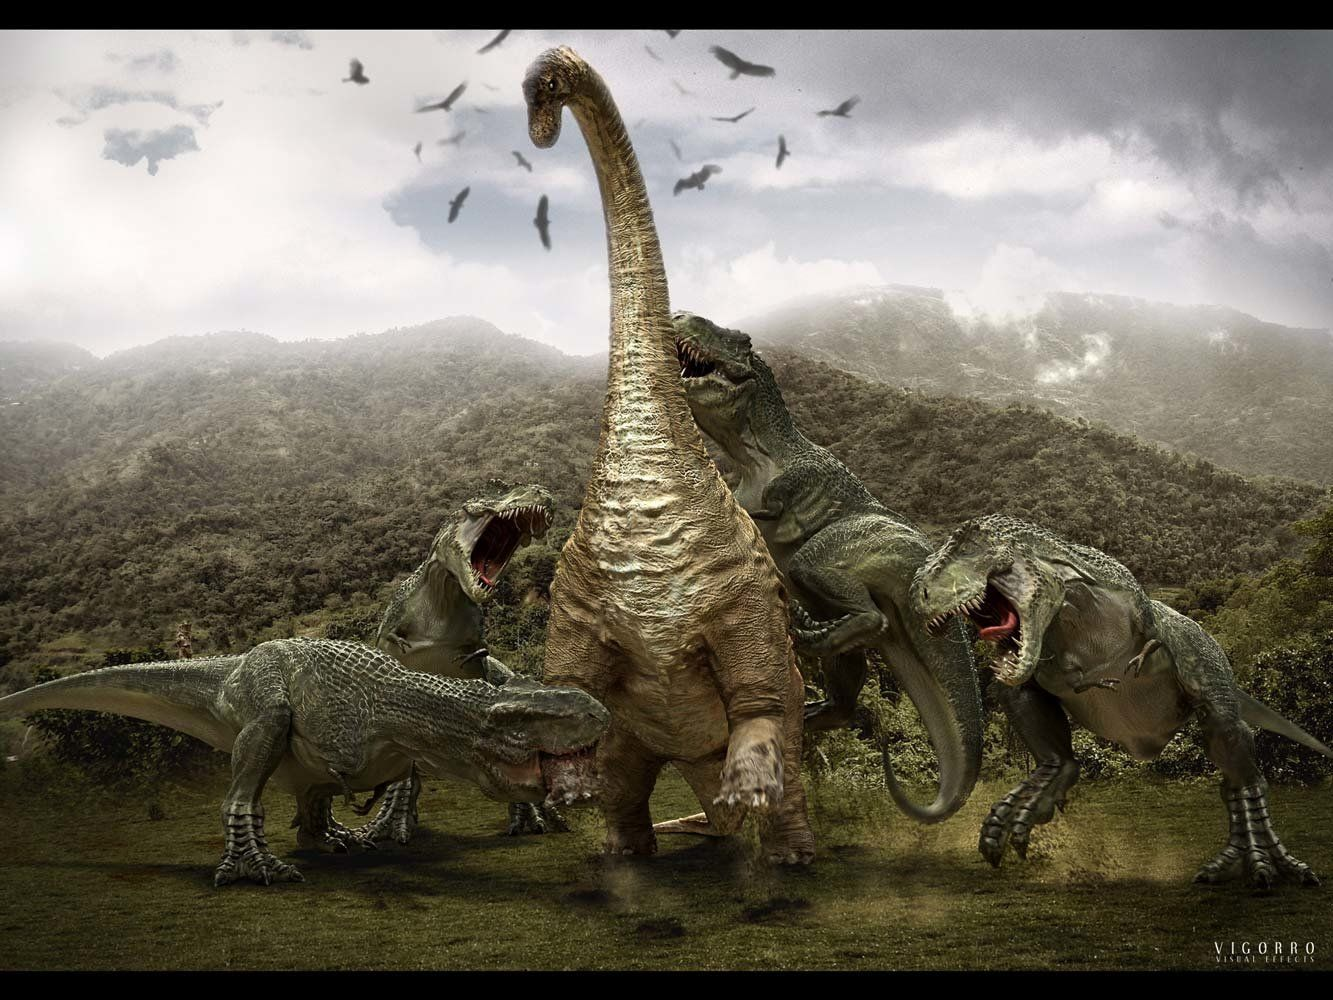 Dinosaur 4k Wallpapers Top Free Dinosaur 4k Backgrounds